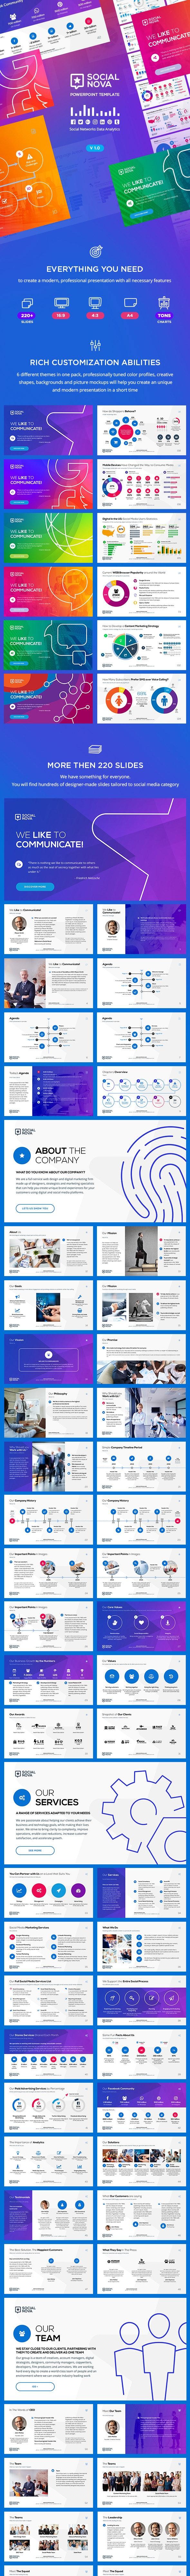 Social Nova PowerPoint Template - Business PowerPoint Templates